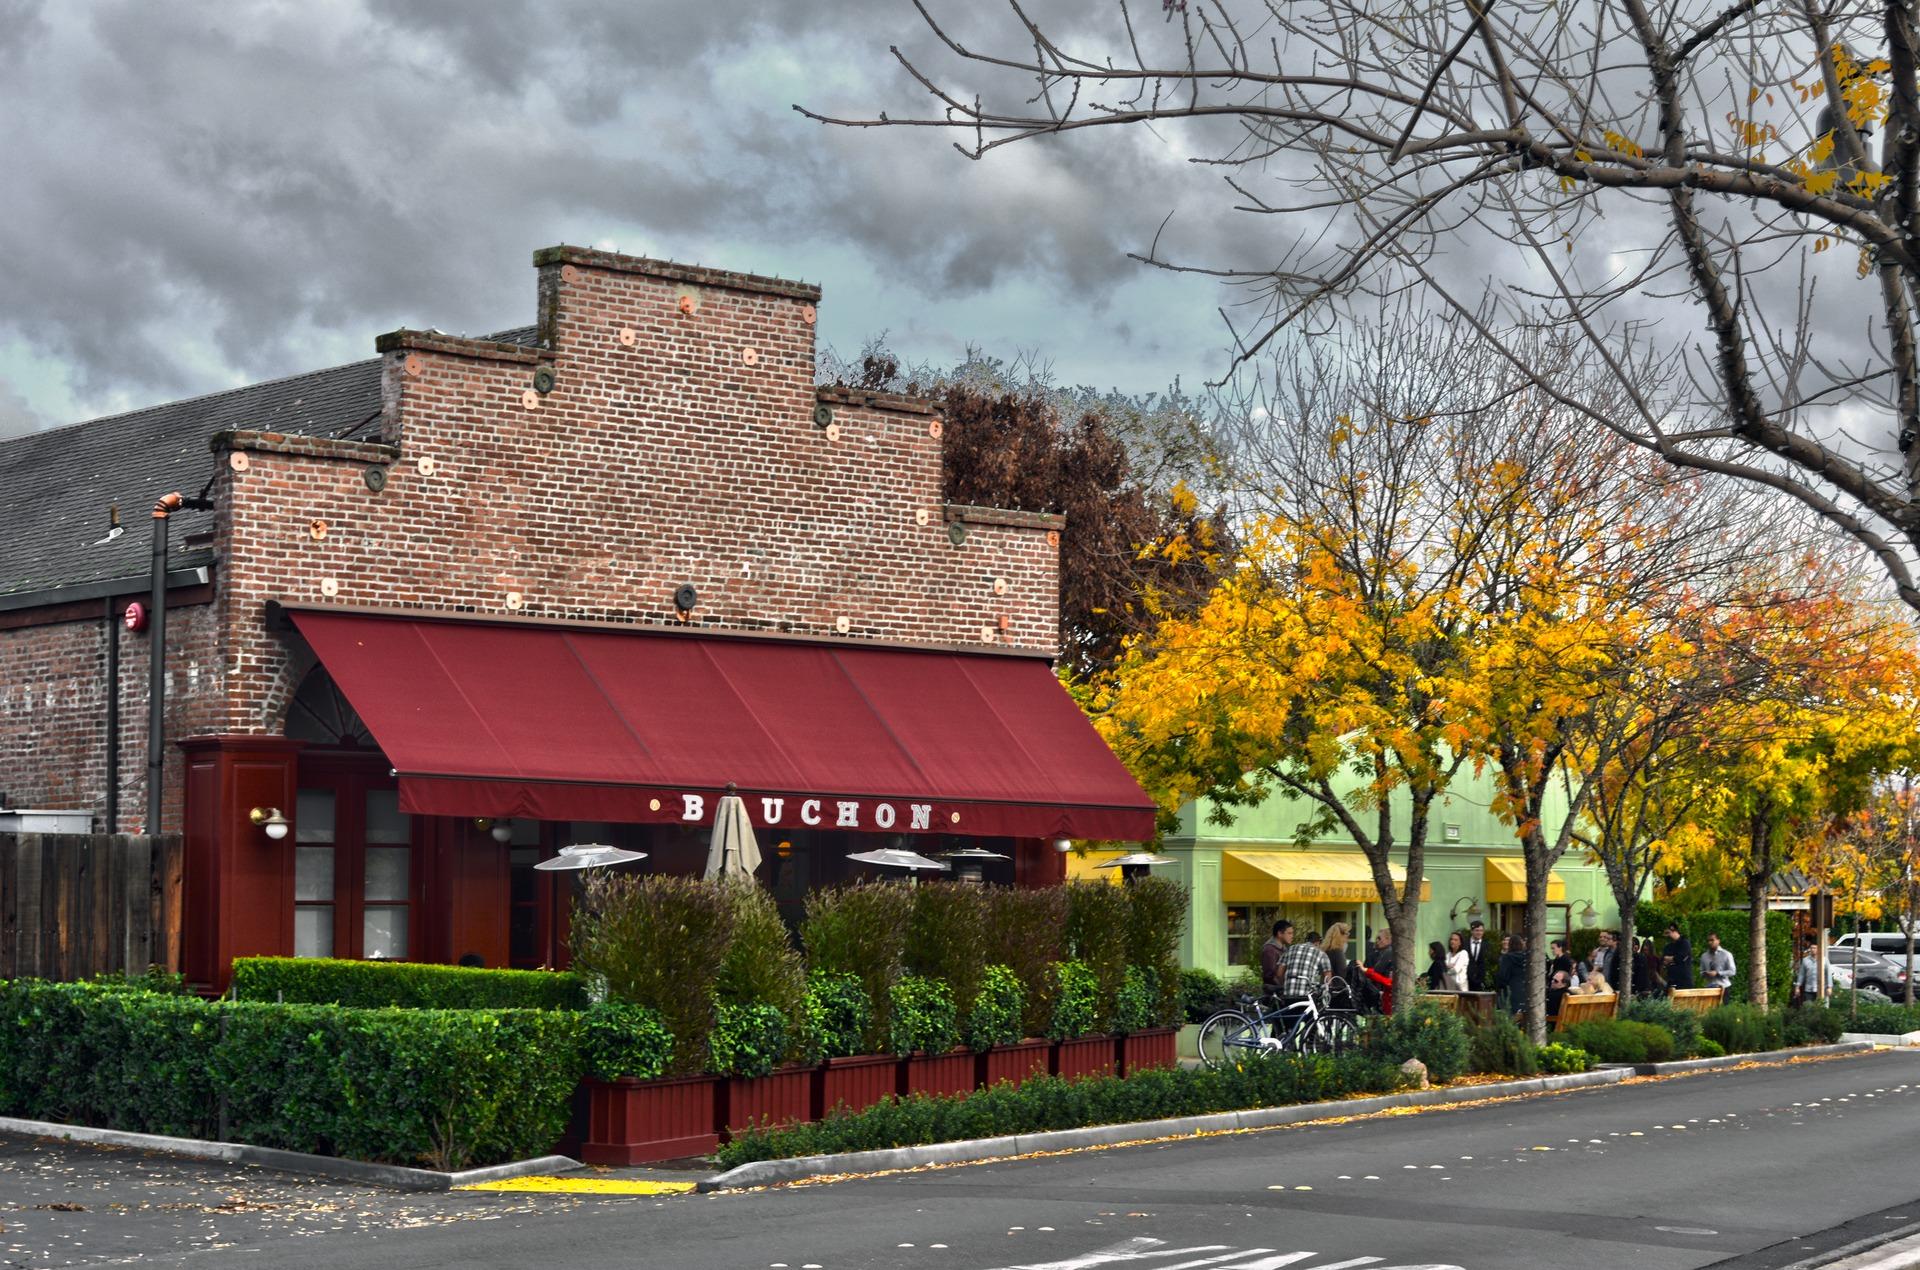 bouchon restaurant wikipedia